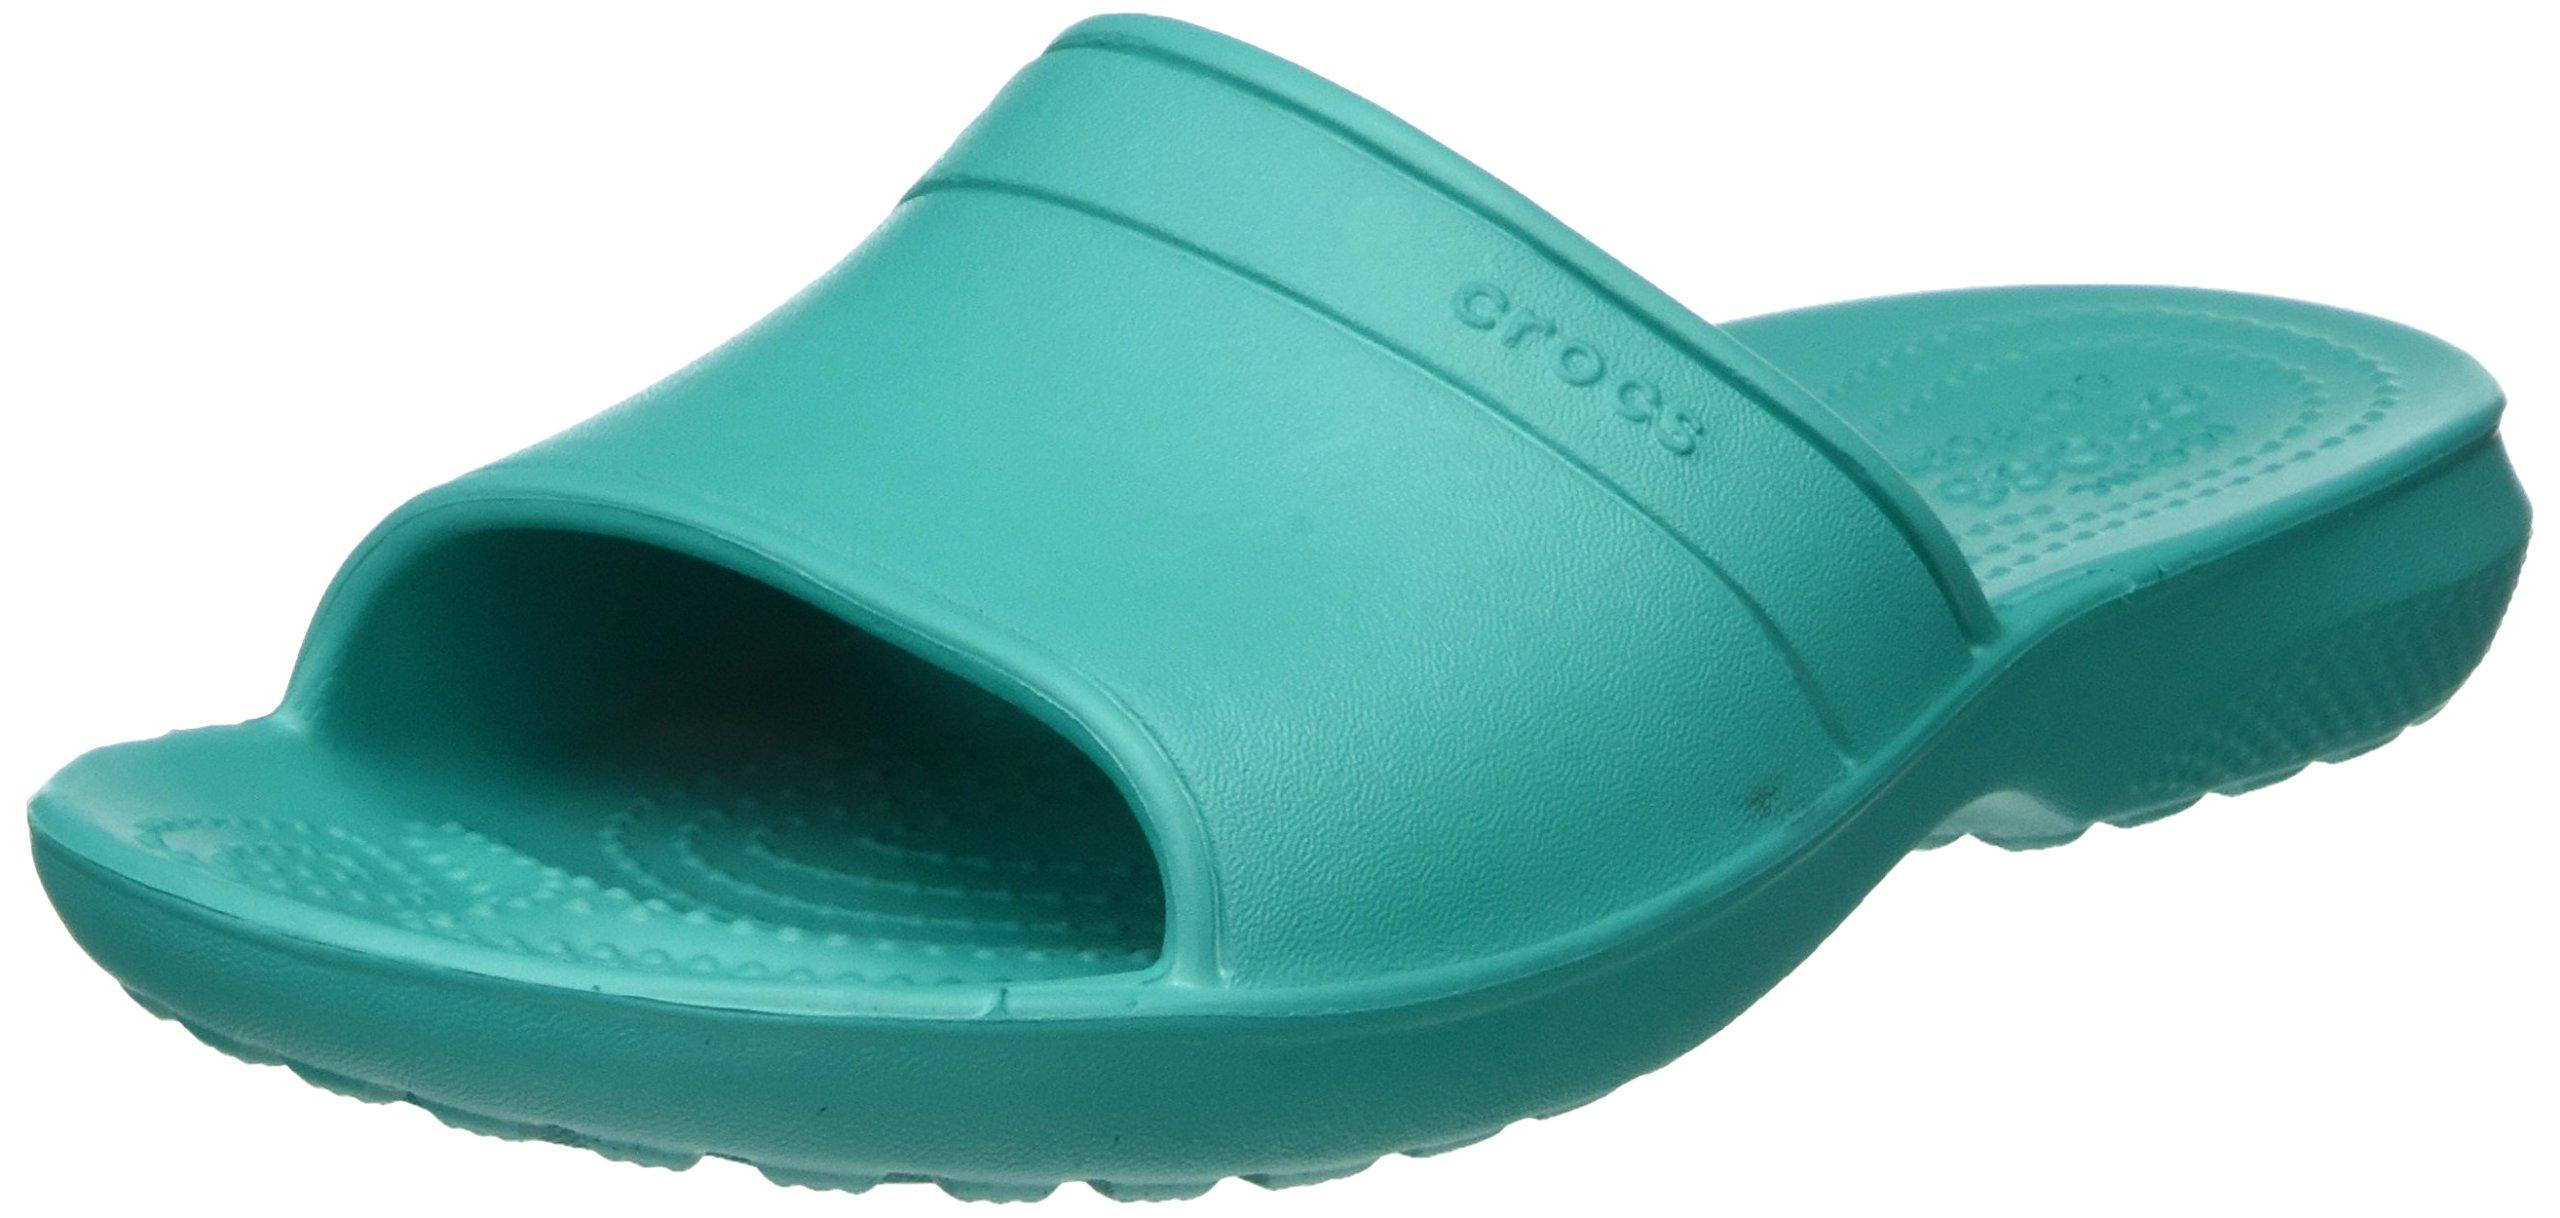 Crocs Unisex Classic Slide Sandal, Tropical Teal, 7 US Men/ 9 US Women